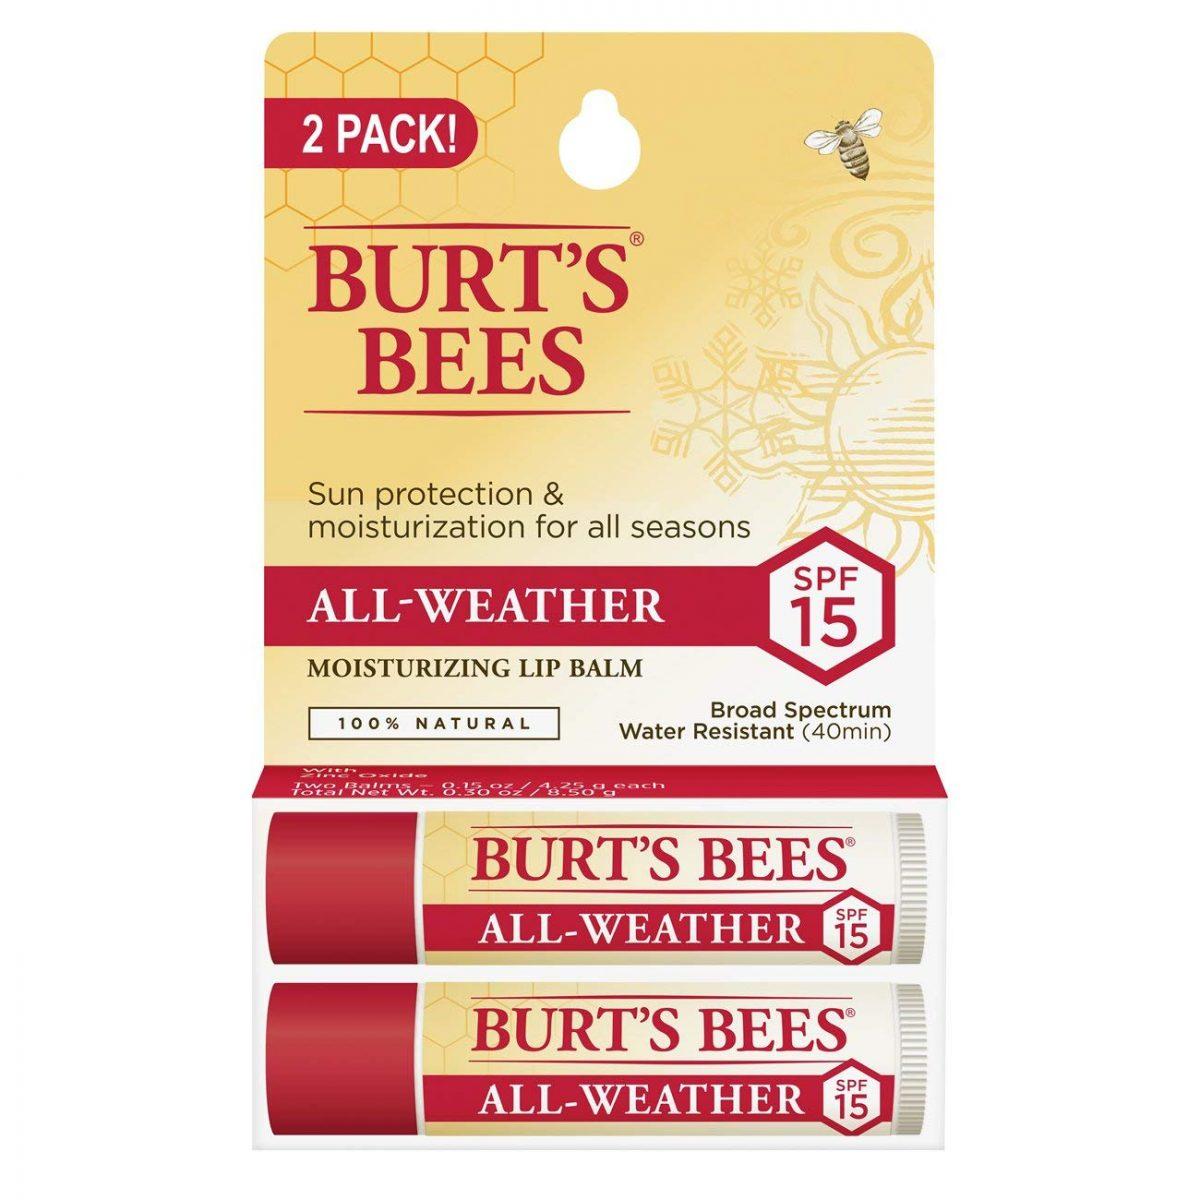 Burt's Bee SPF 15